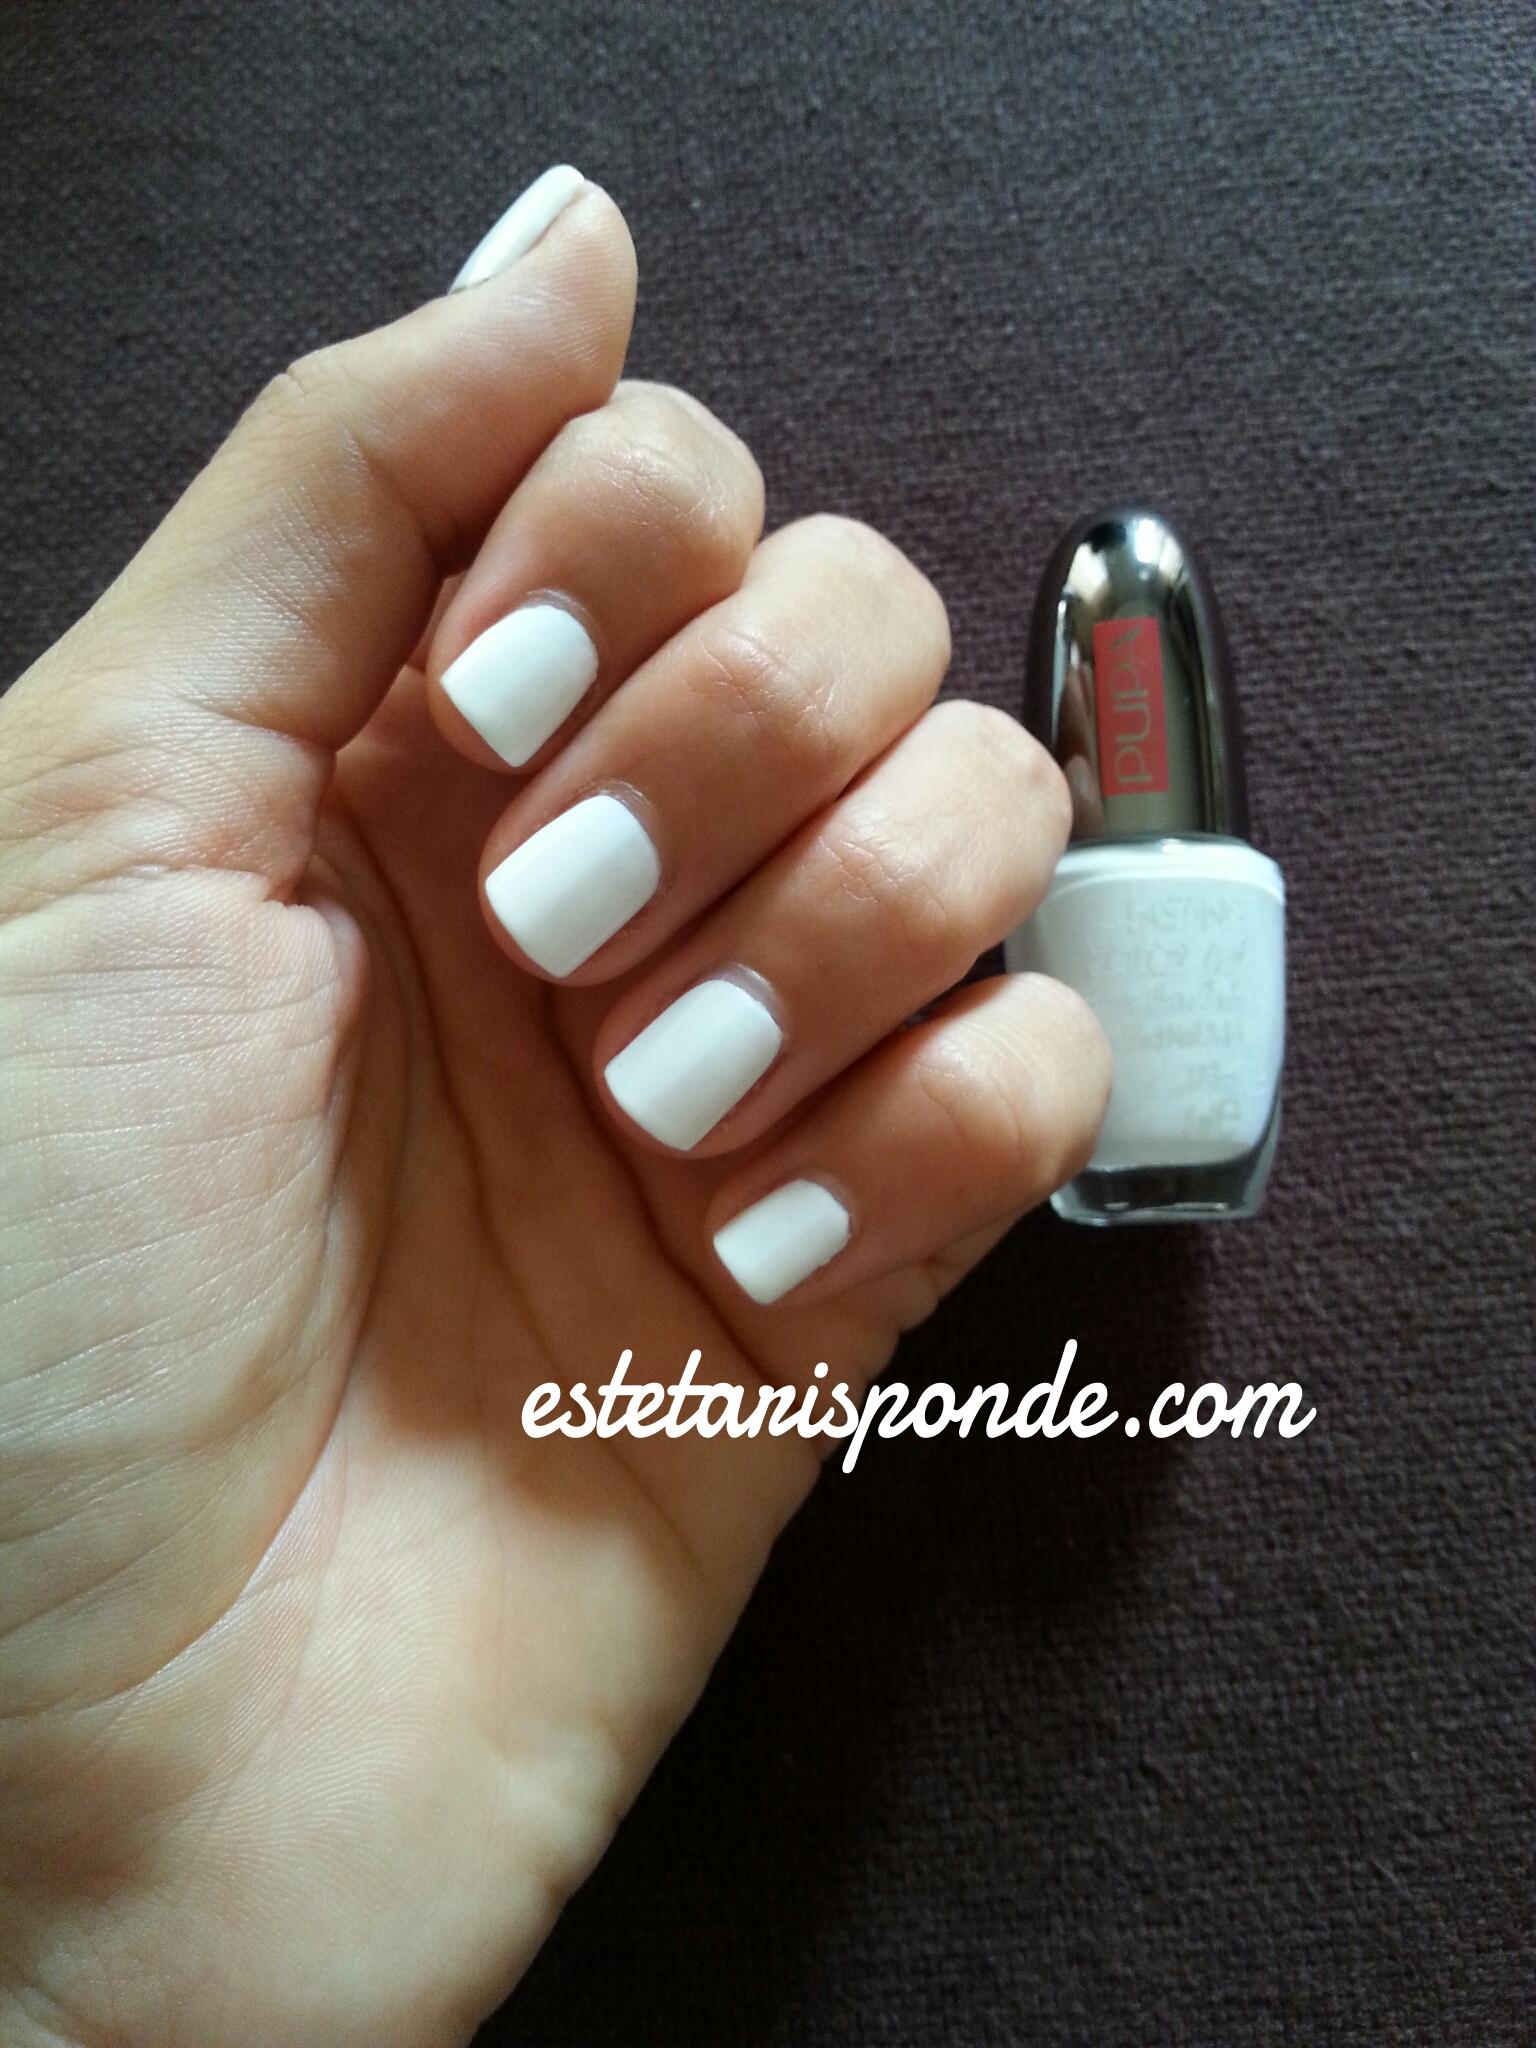 Estremamente PUPA Lasting Color gel #072: total white! - Esteta risponde IK06